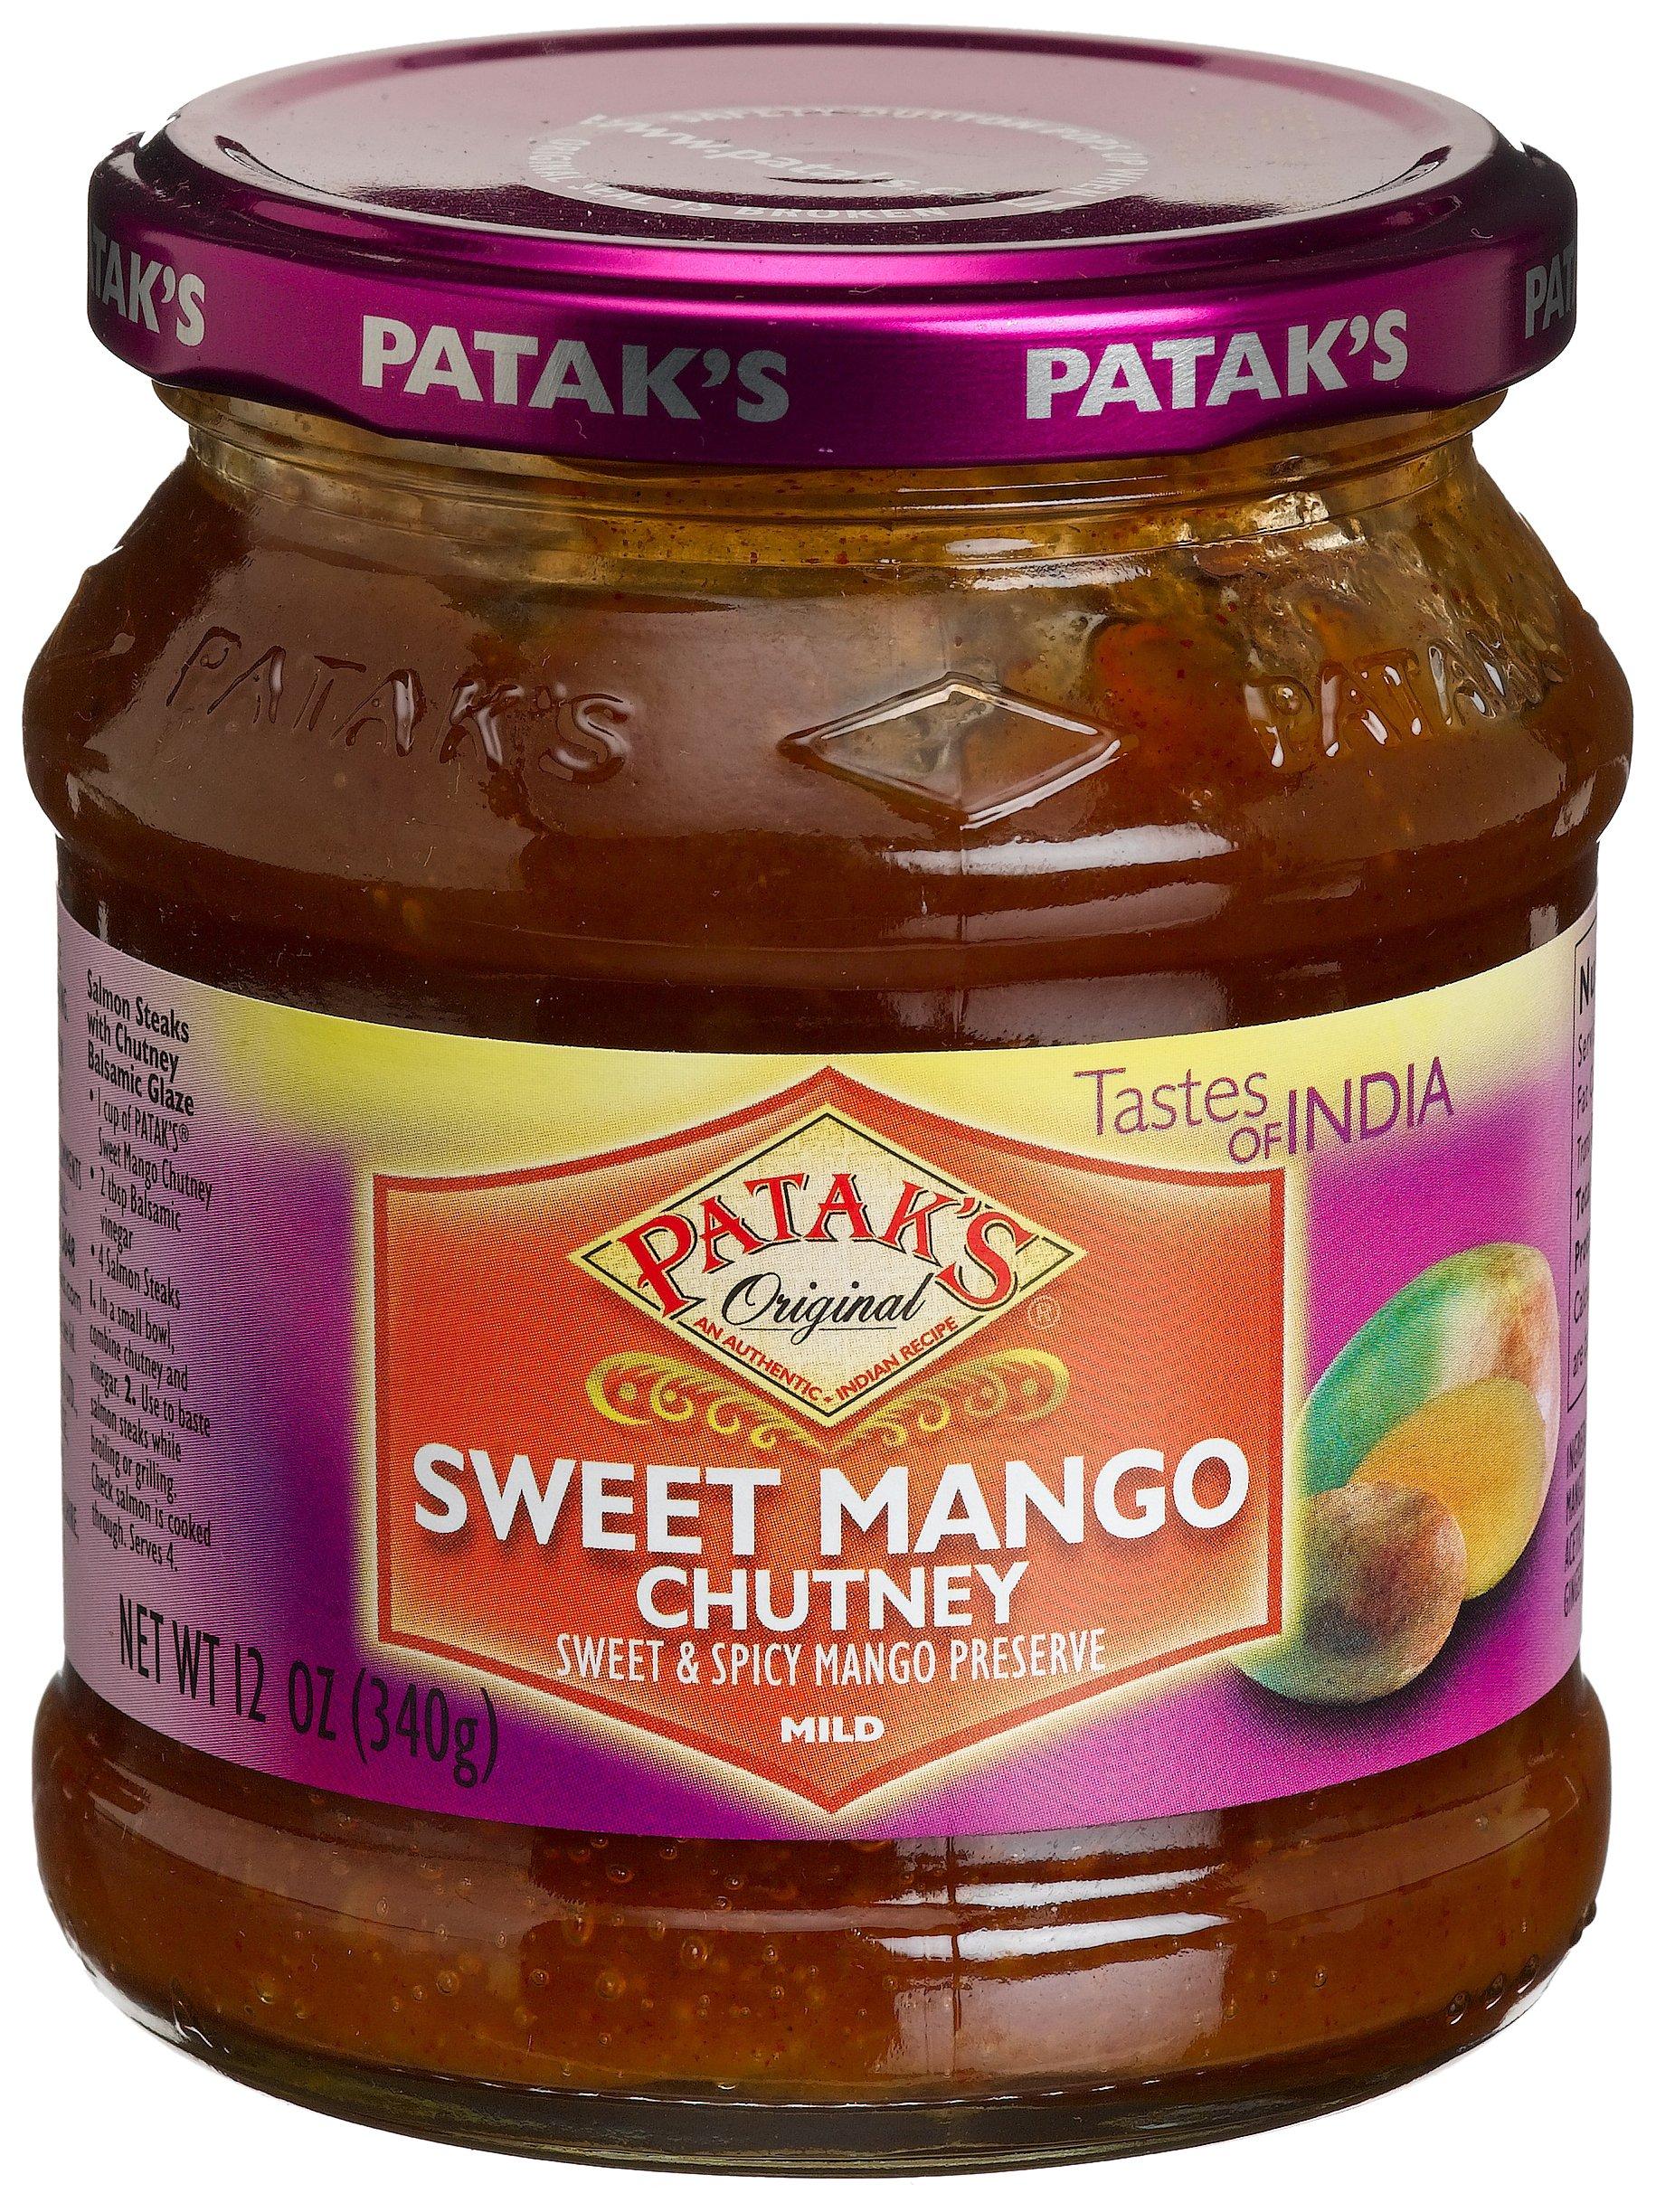 Patak's Sweet Mango Chutney, Mild, 12-Ounce Glass Jars (Pack of 6)